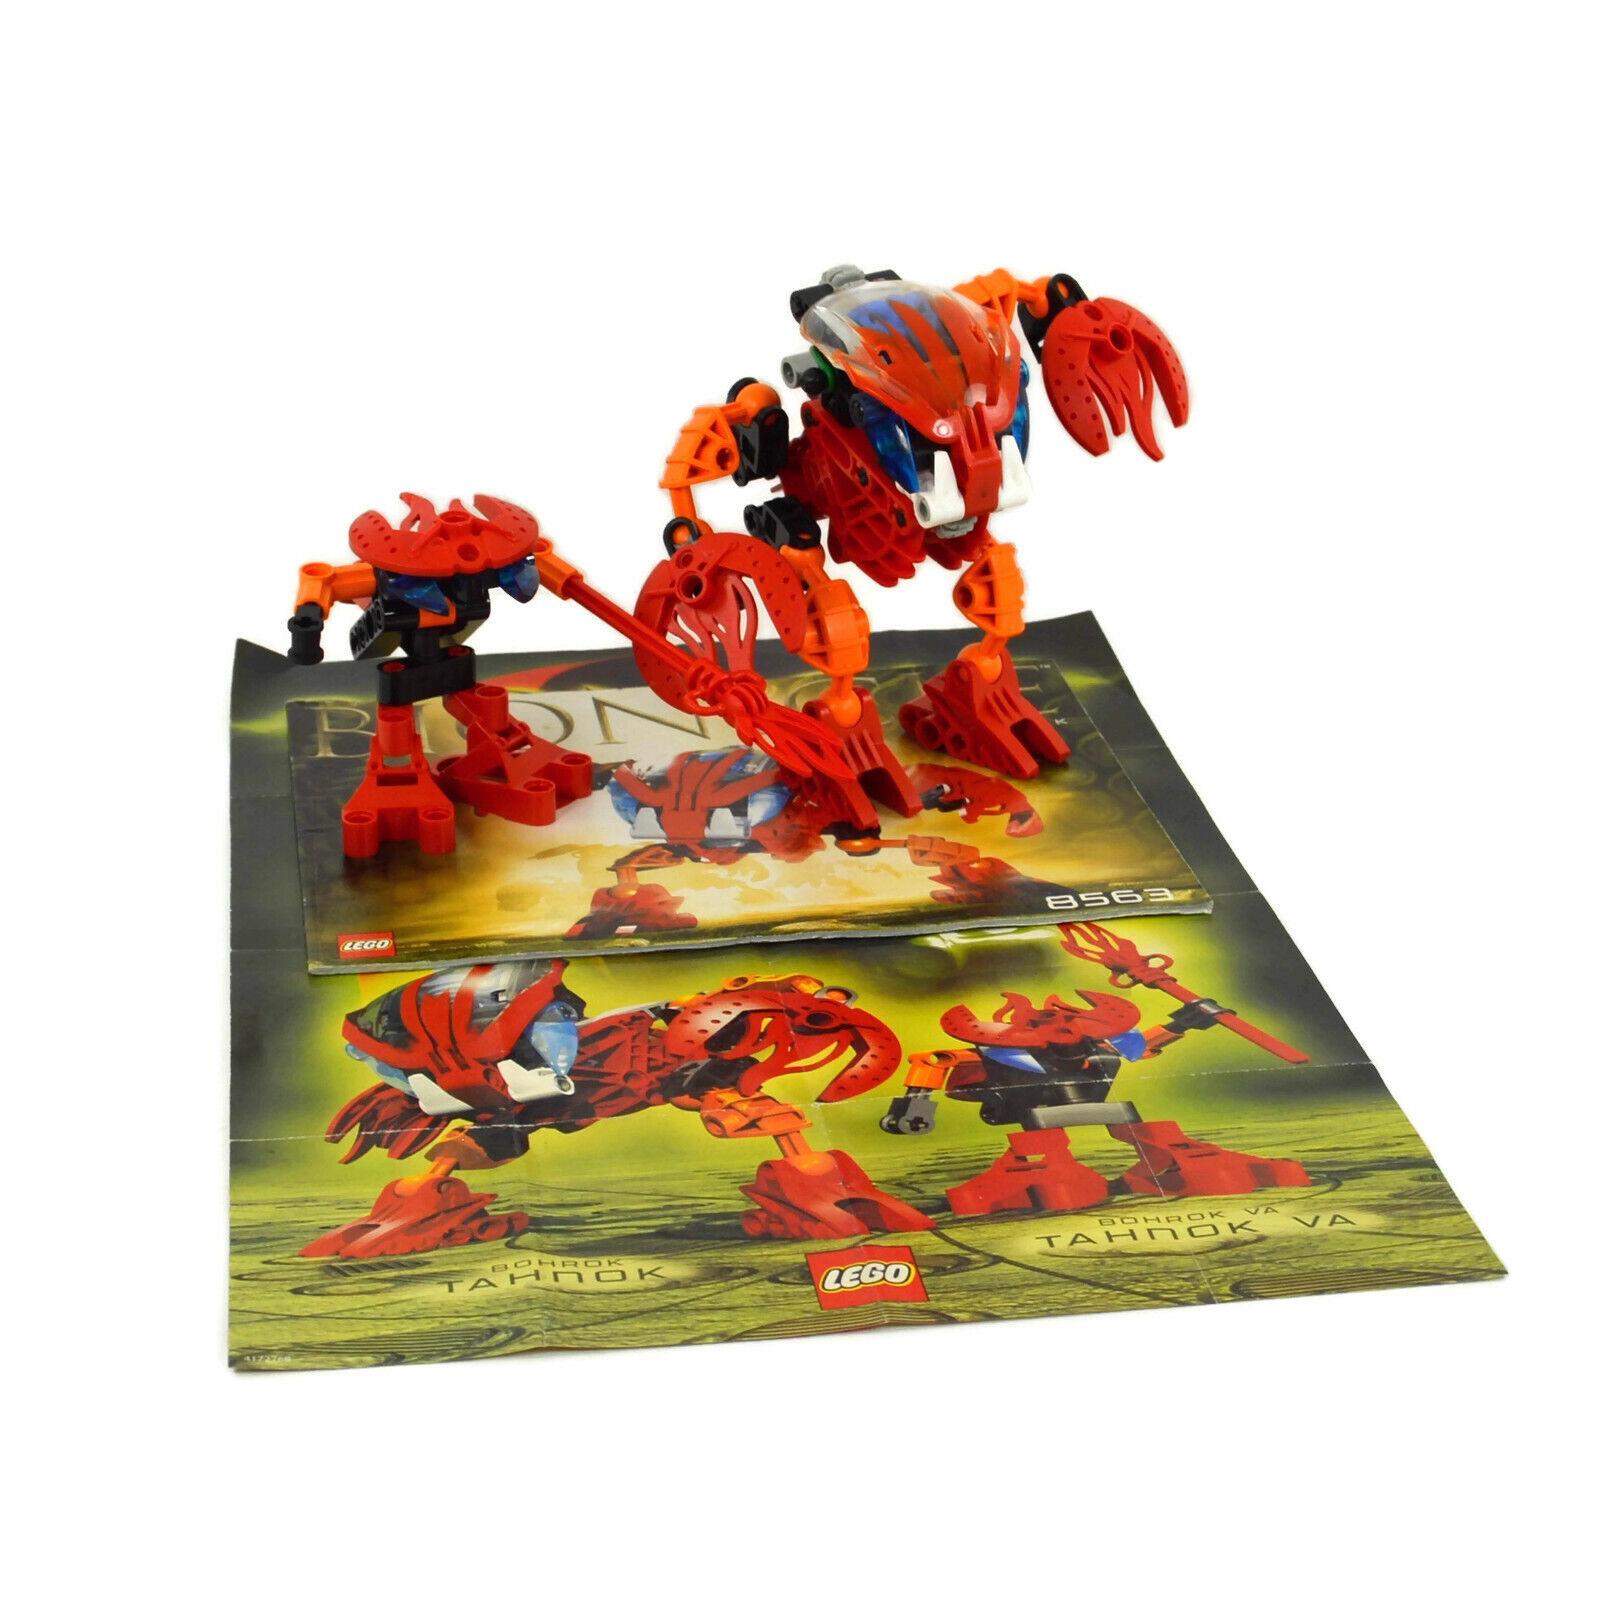 LEGO Bionicle Bohrok Tahnok  and Tahnok Va Complete with Instructions No Box